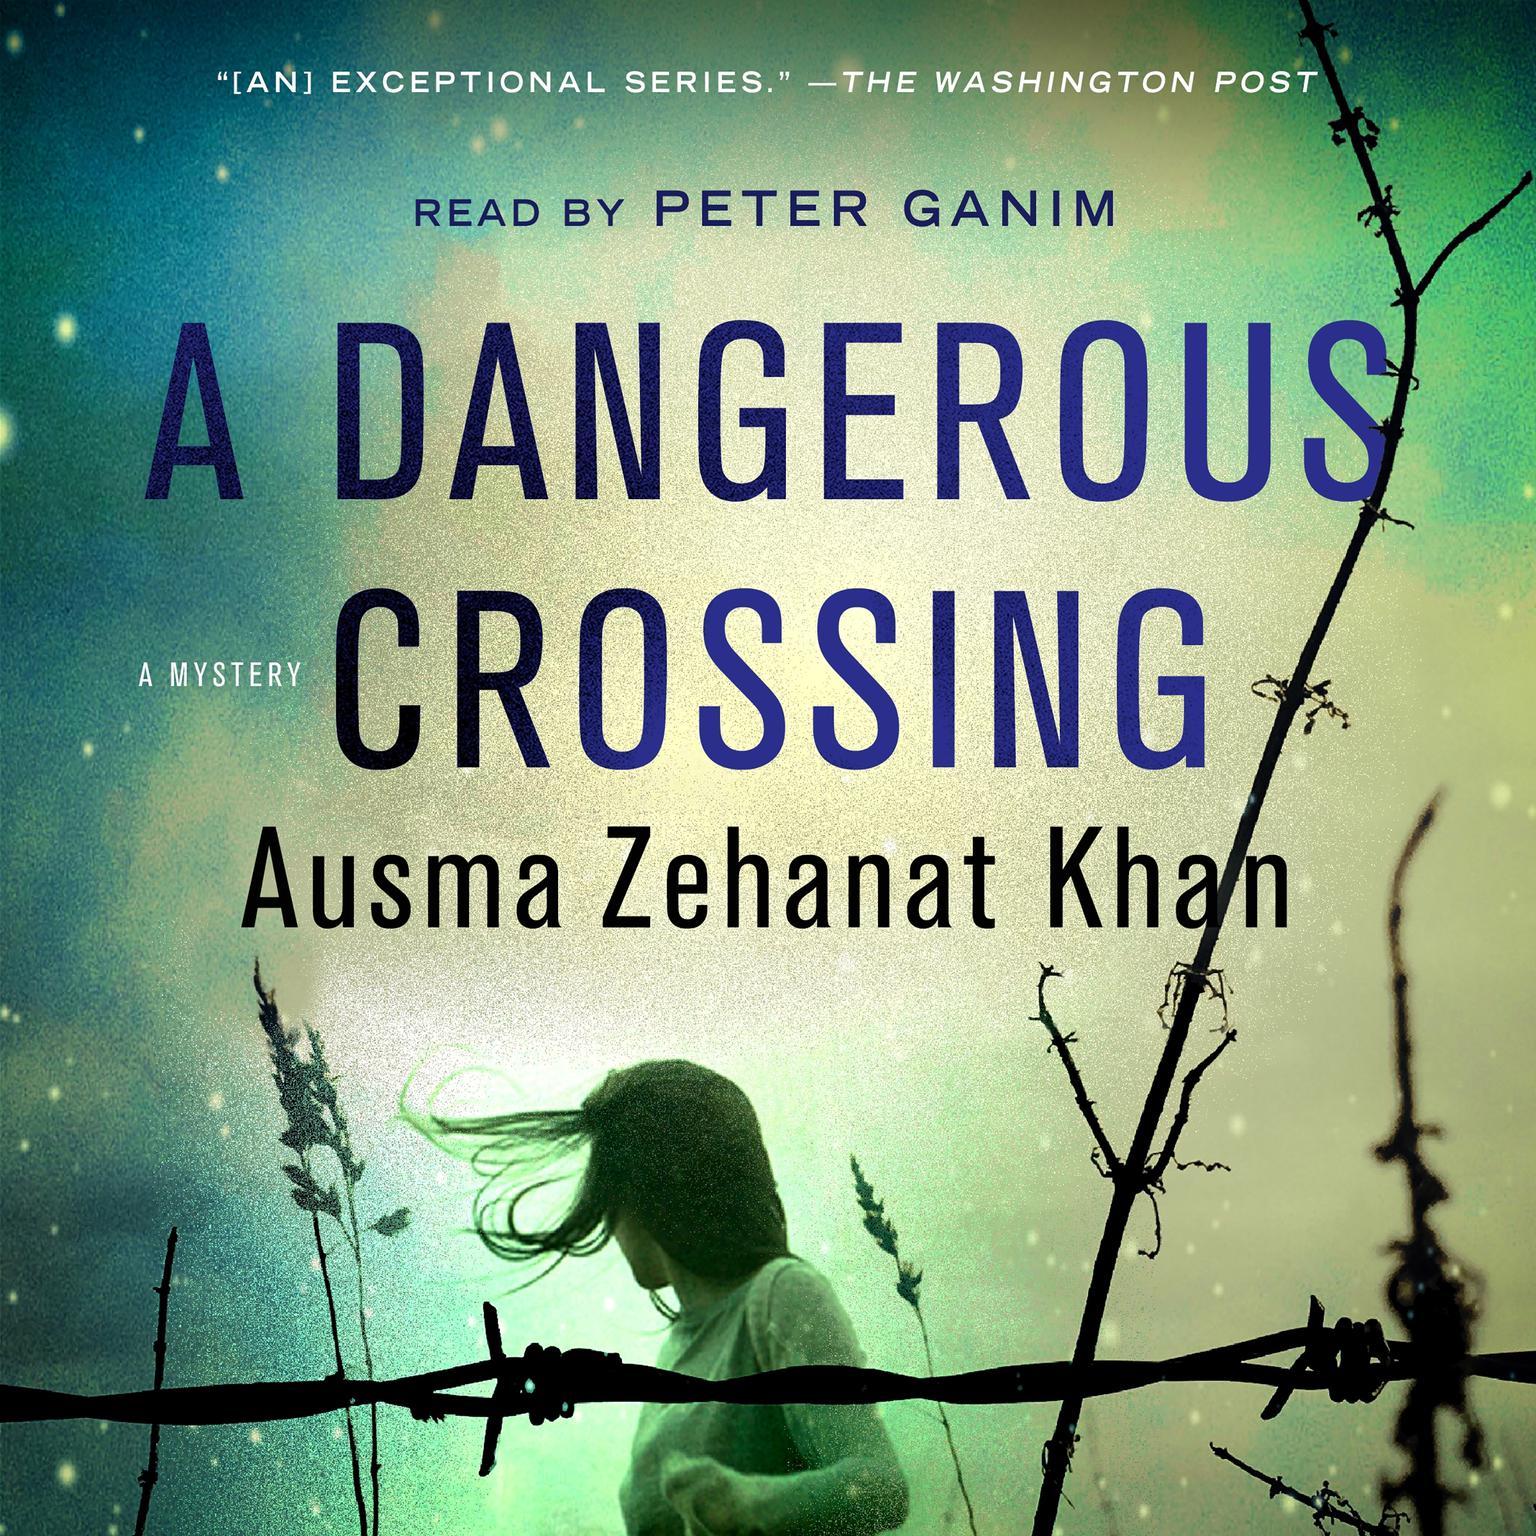 A Dangerous Crossing: A Novel Audiobook, by Ausma Zehanat Khan